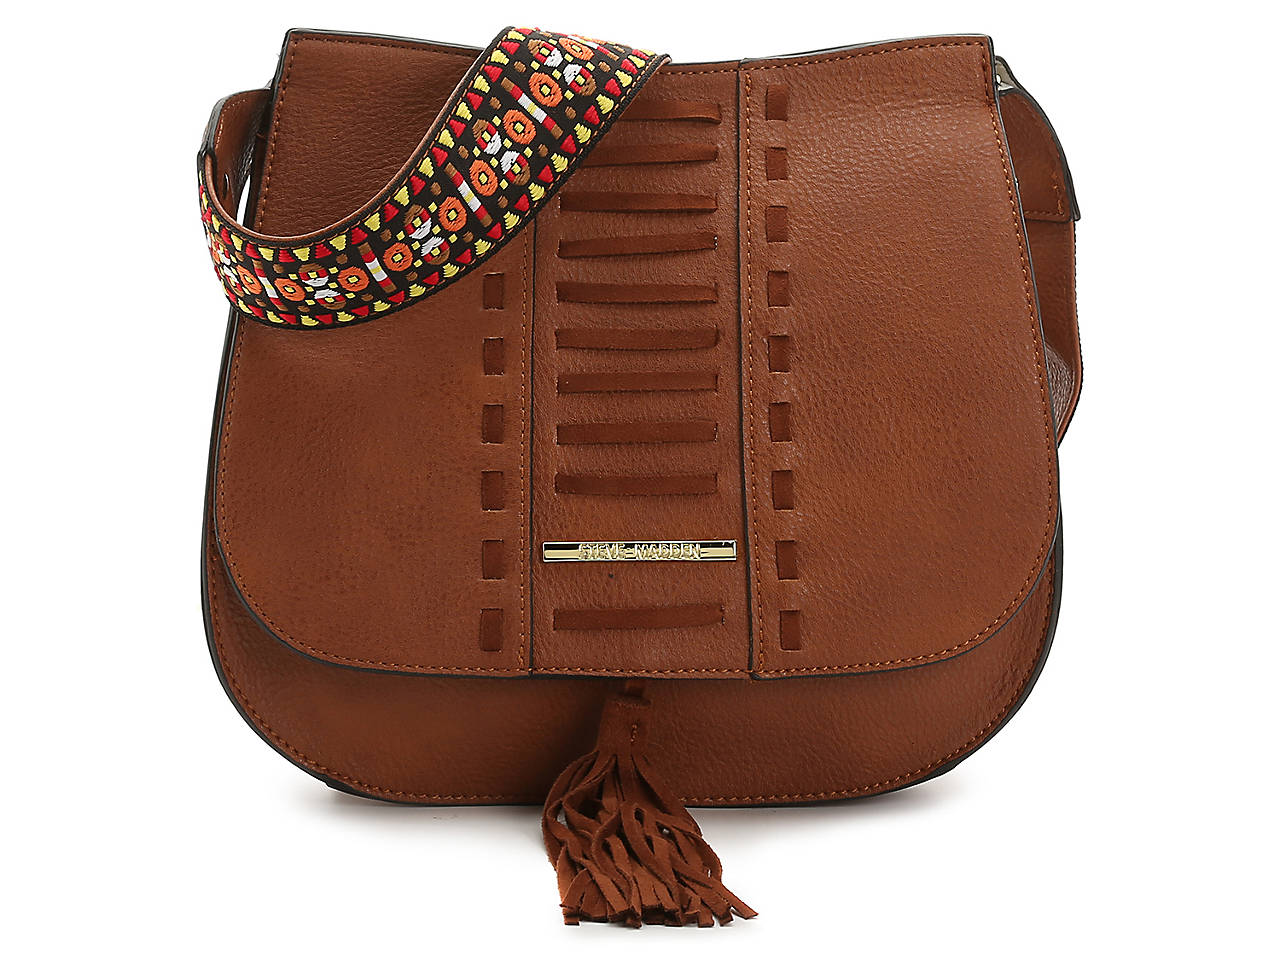 658db659602 Steve Madden Keegan Crossbody Bag Women's Handbags & Accessories | DSW